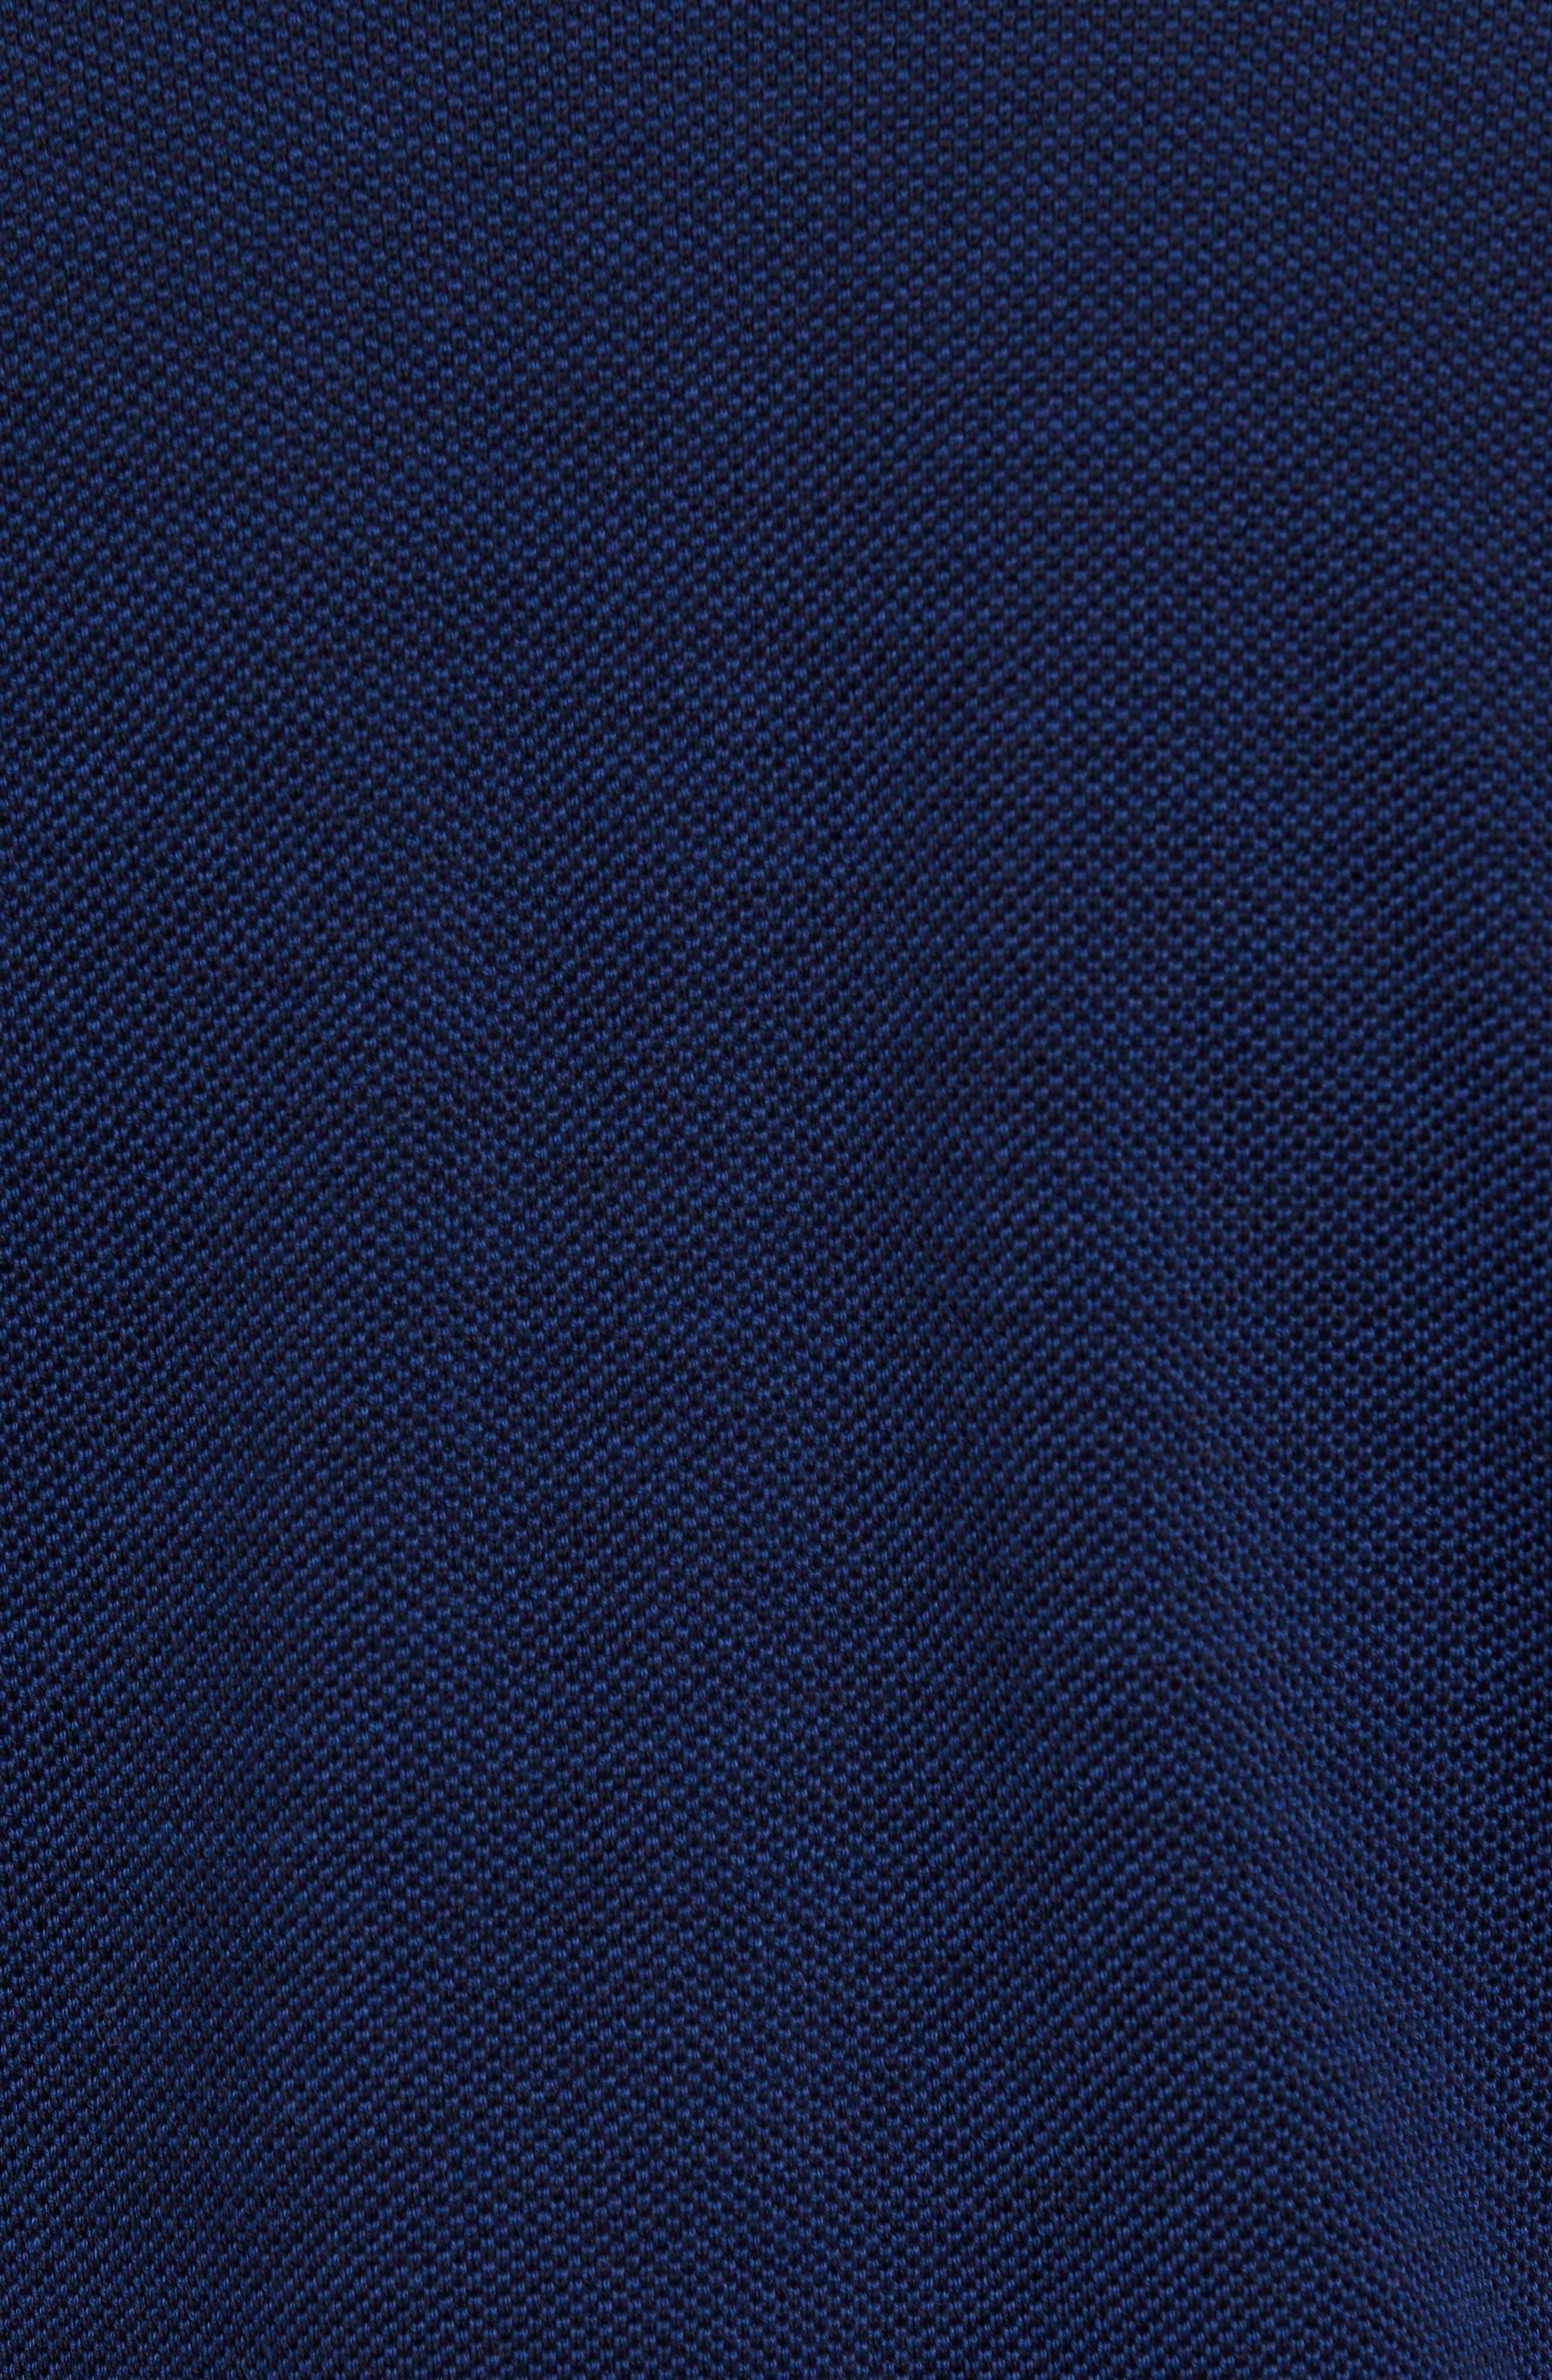 Paul&Shark Piqué Zip Wool Sweater,                             Alternate thumbnail 5, color,                             400